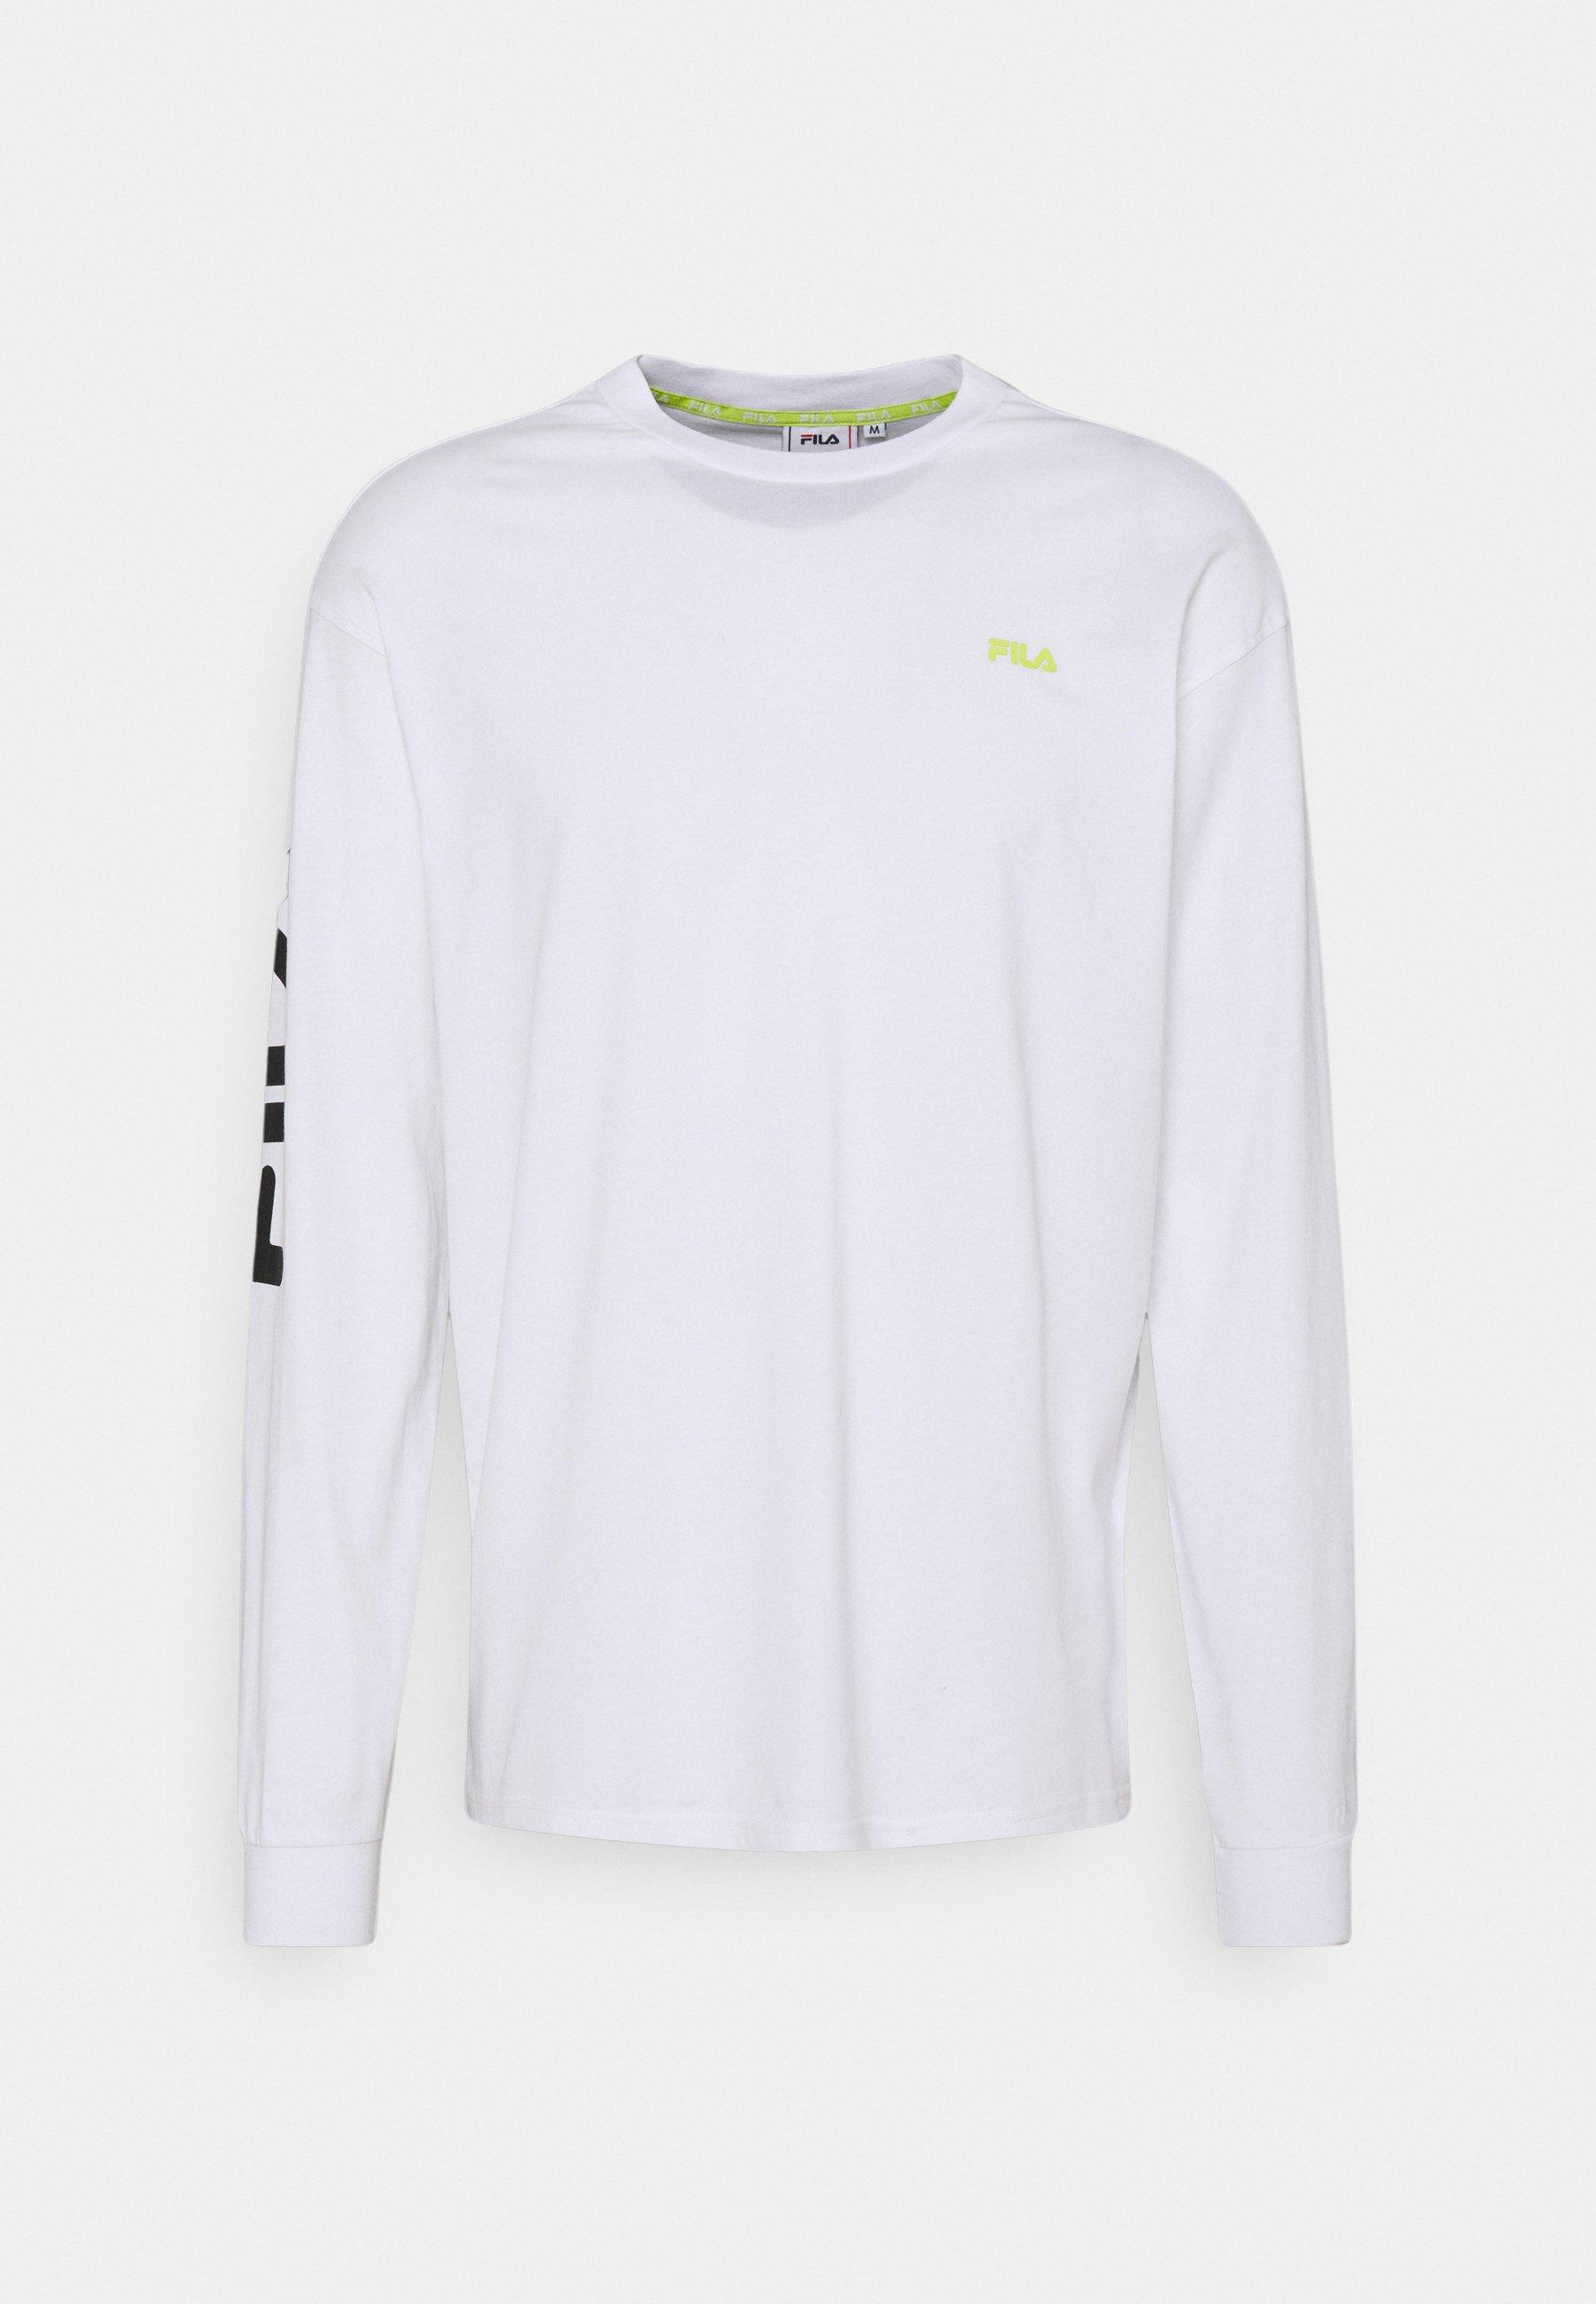 Uomo DESTINO GRAPHIC LONG SLEEVE SHIRT - Maglietta a manica lunga